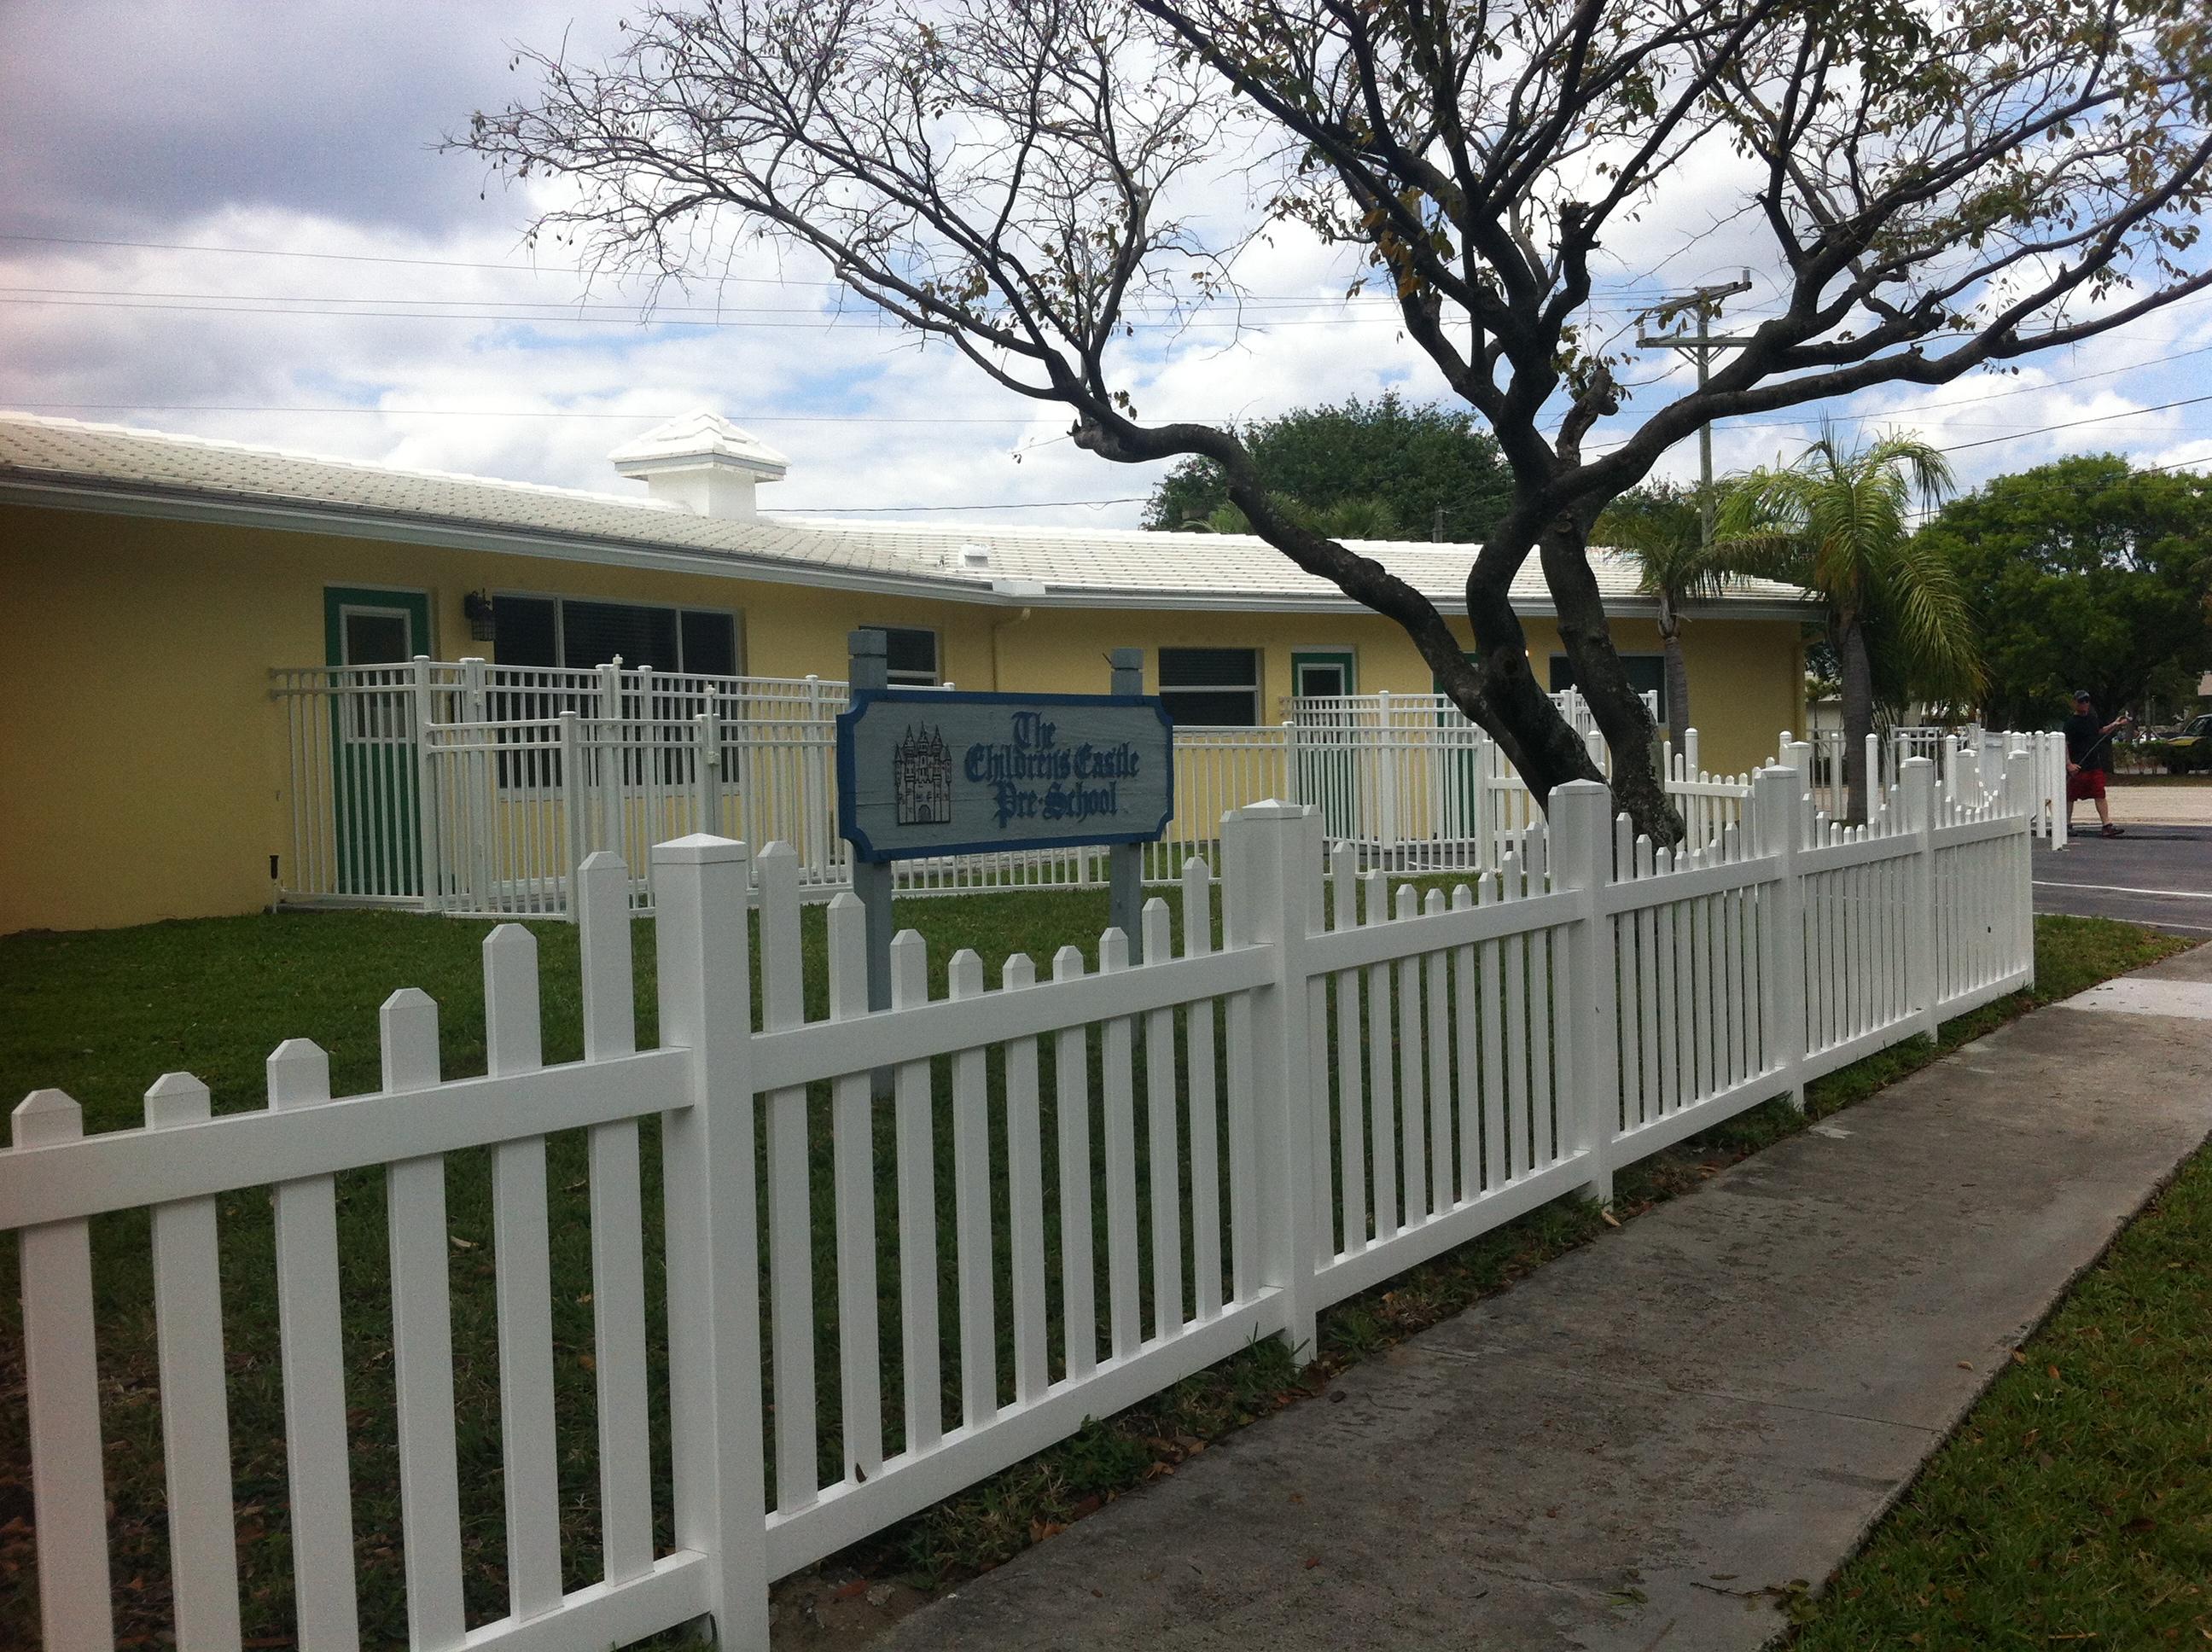 Pvc Residential Fence Building Bulldog Fence Company Of South Florida regarding size 2592 X 1936